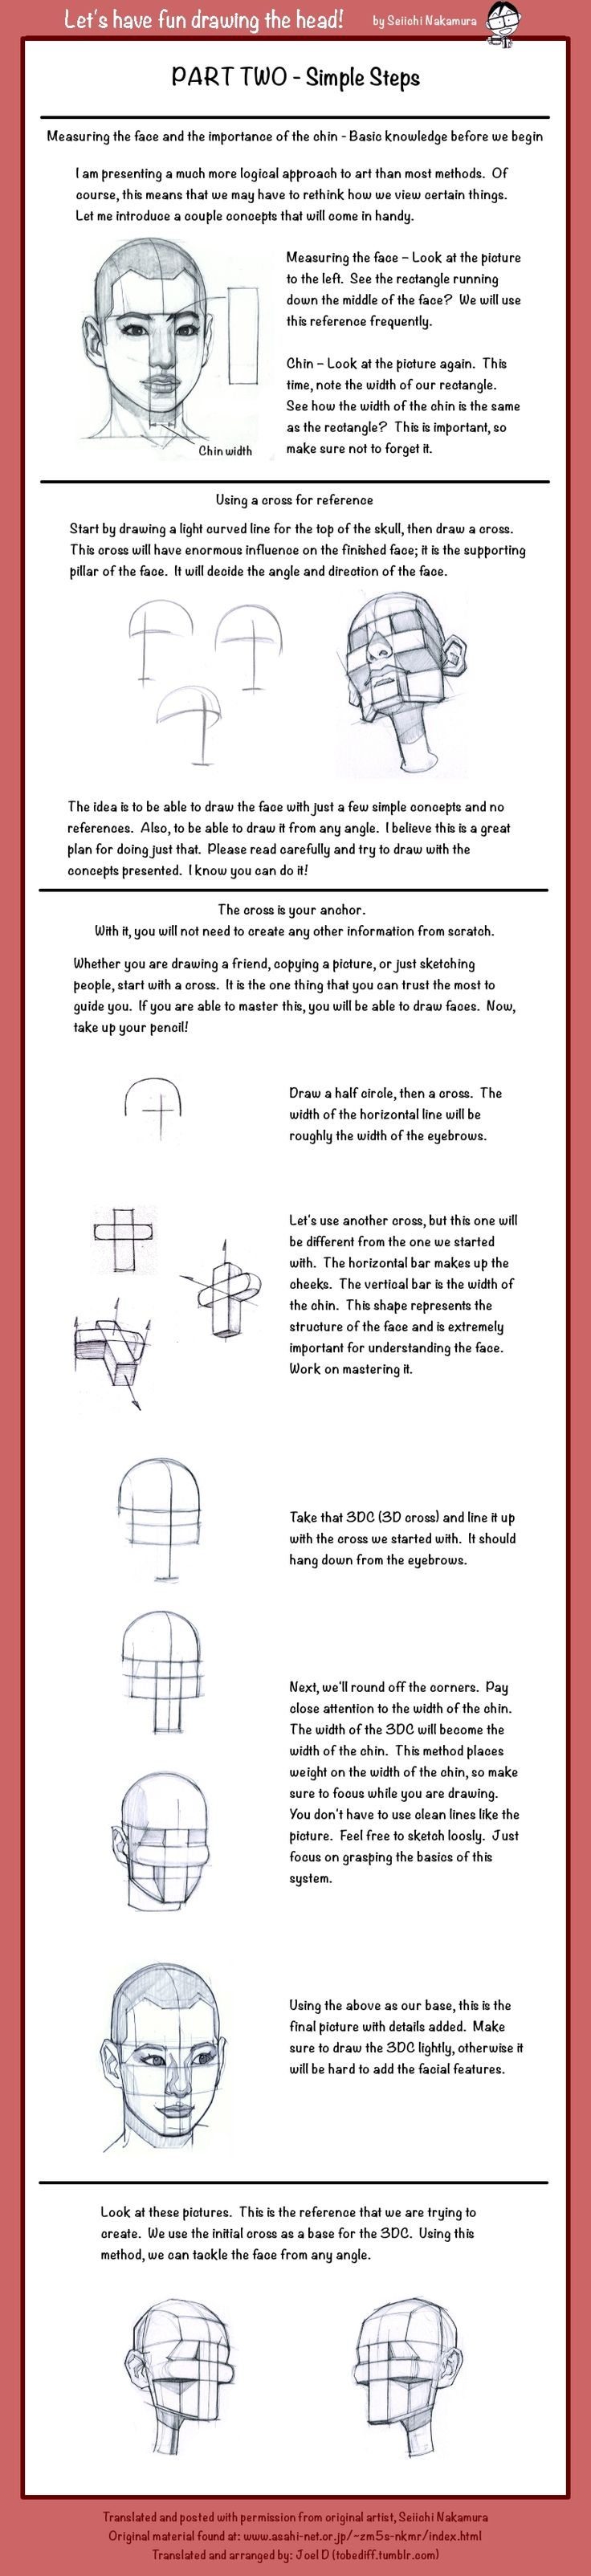 DRAWING THE HEAD 2: Simple Steps by Seiichi Nakamura & Joel D http://tobediff.tumblr.com